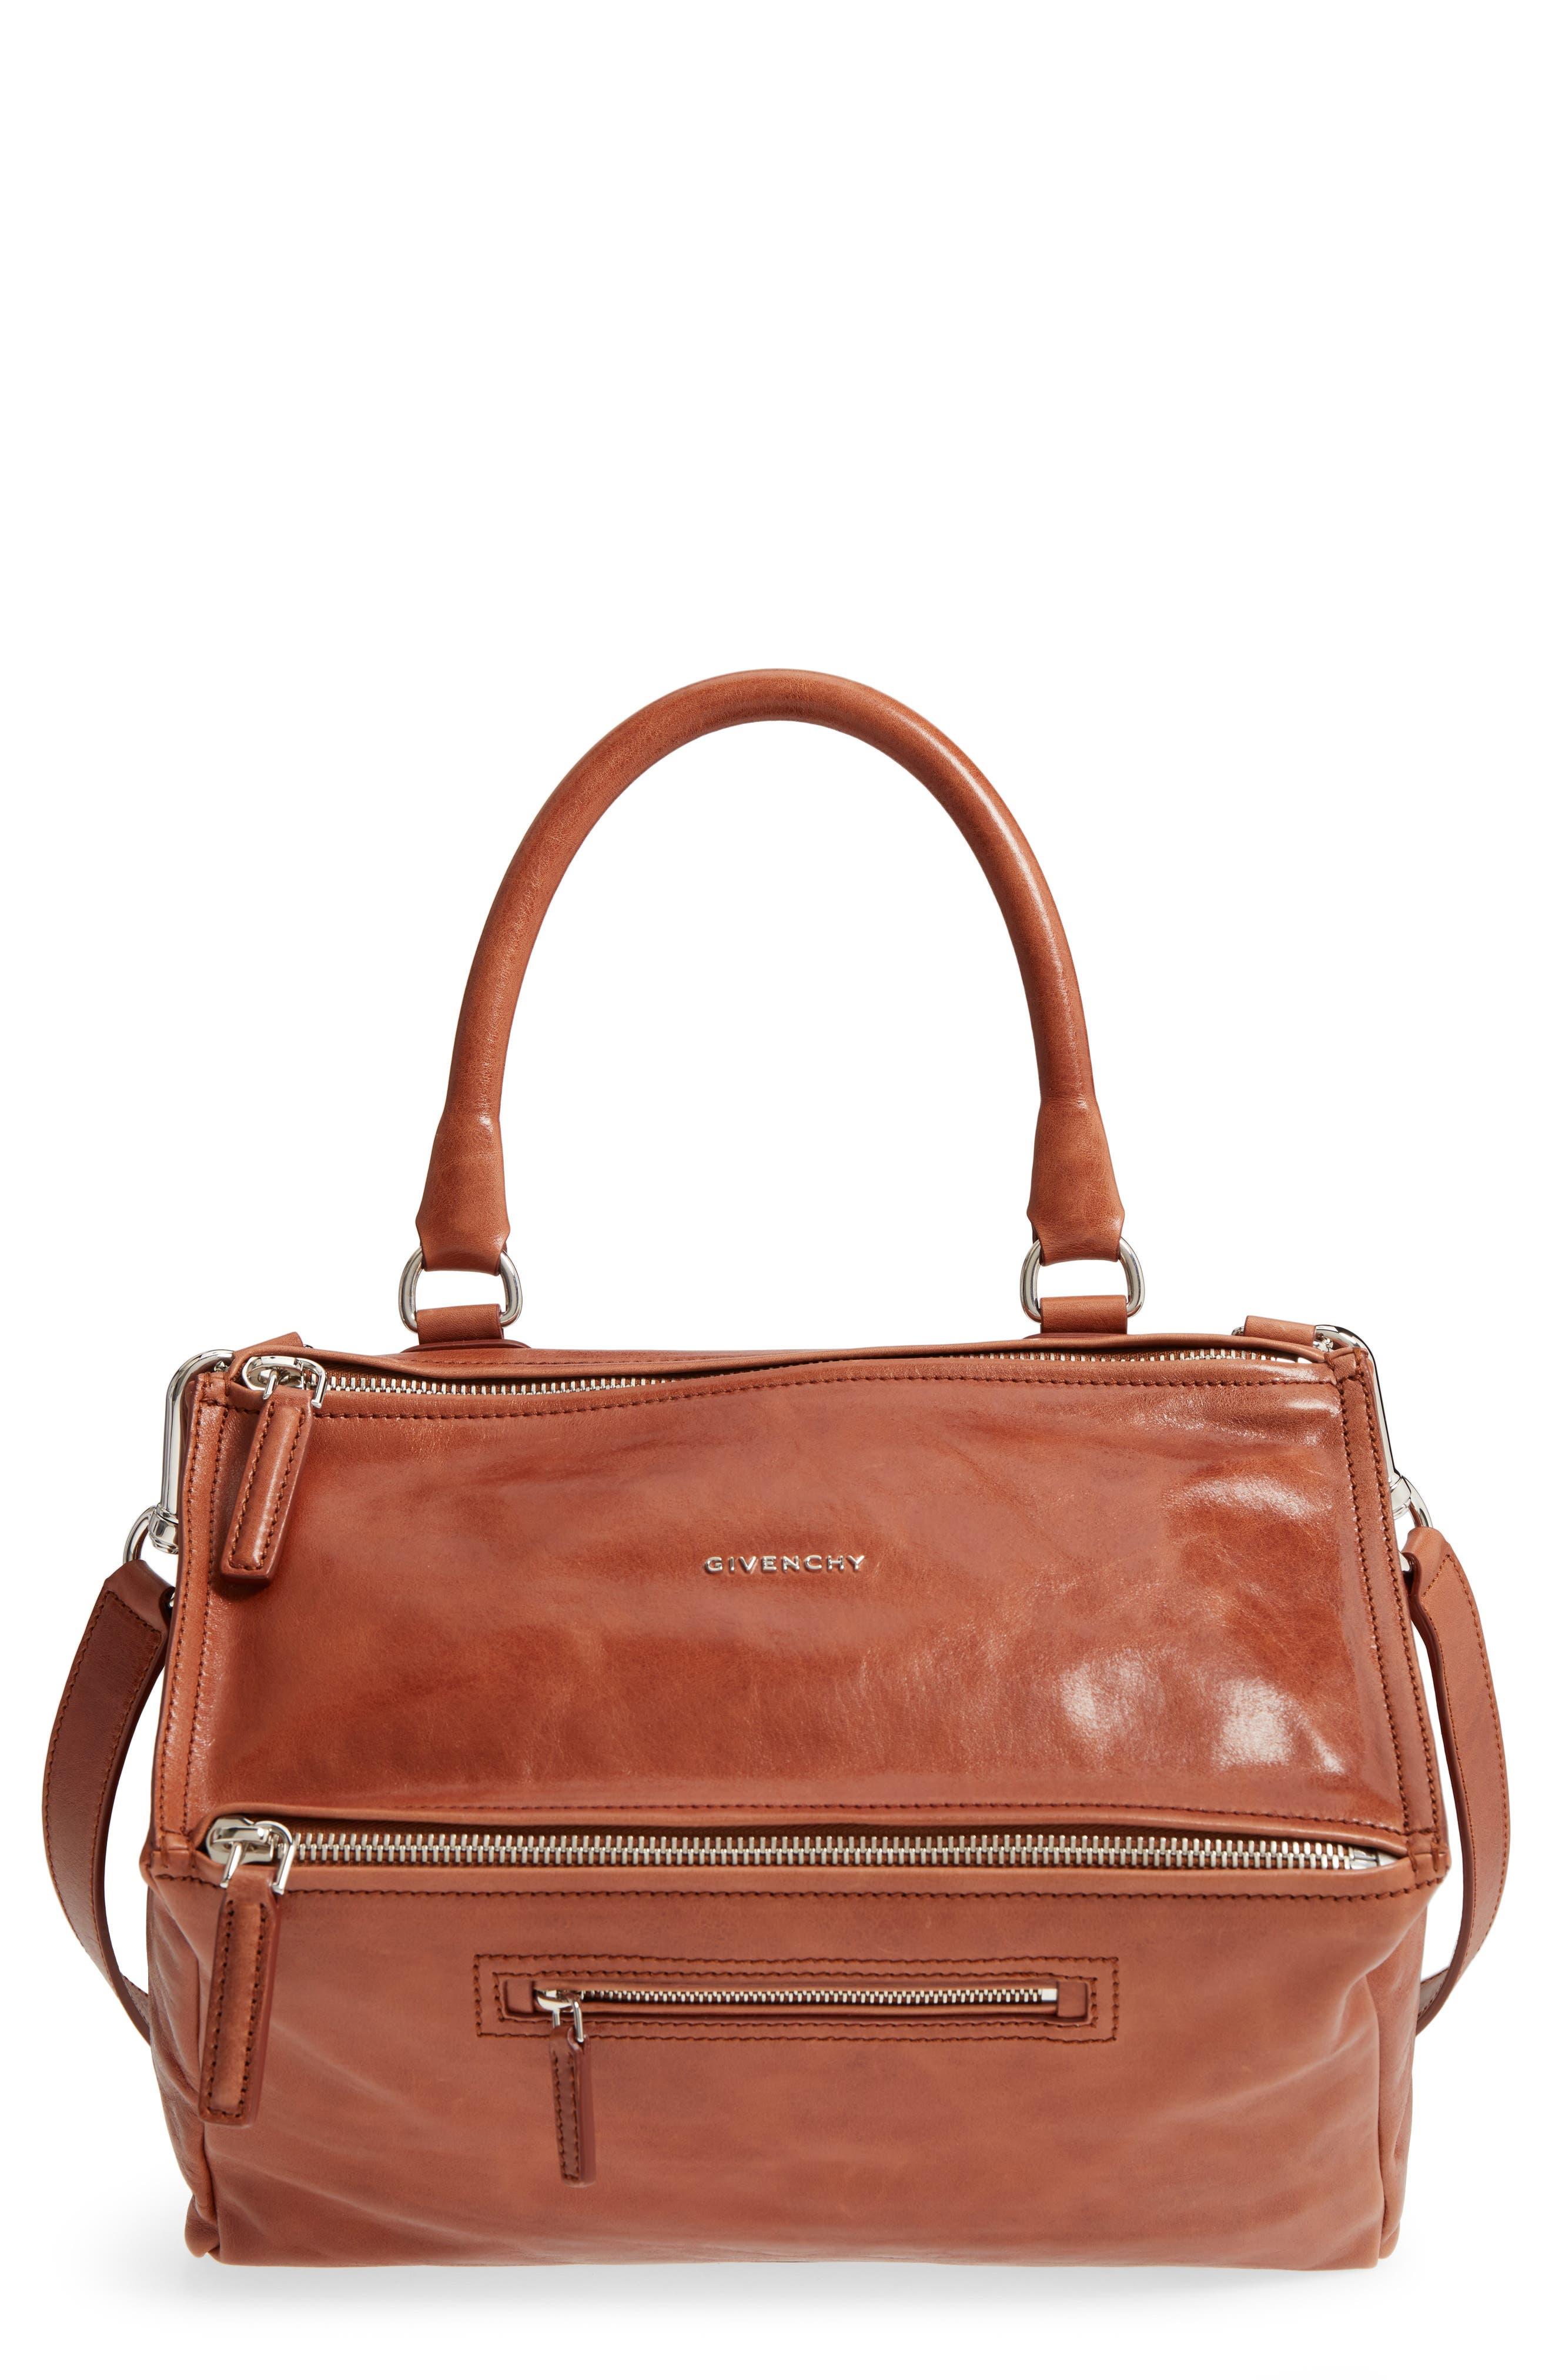 Medium Pandora Shiny Aged Leather Satchel,                         Main,                         color, 217